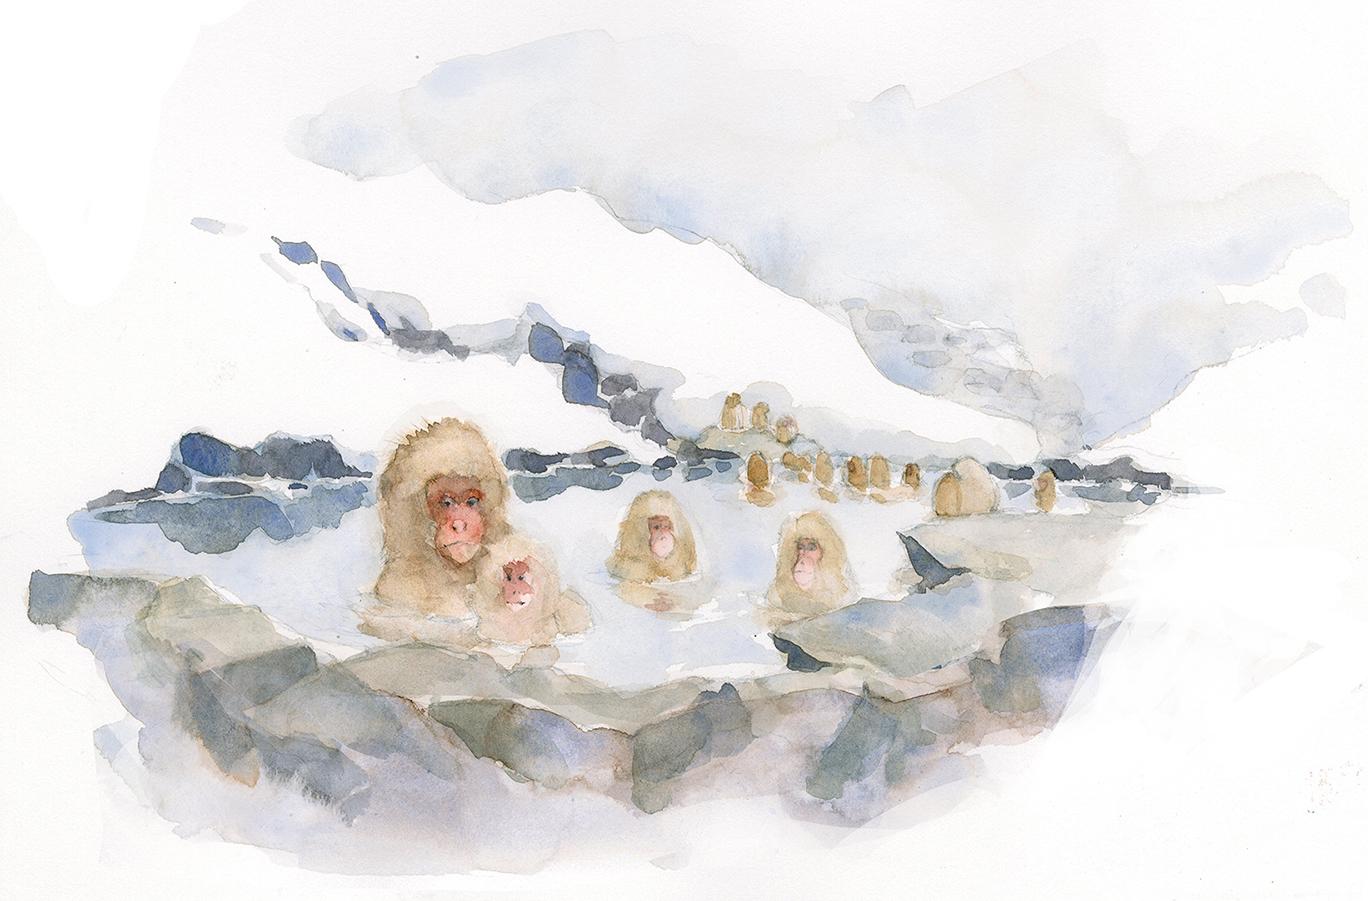 snow+monkeys.jpg